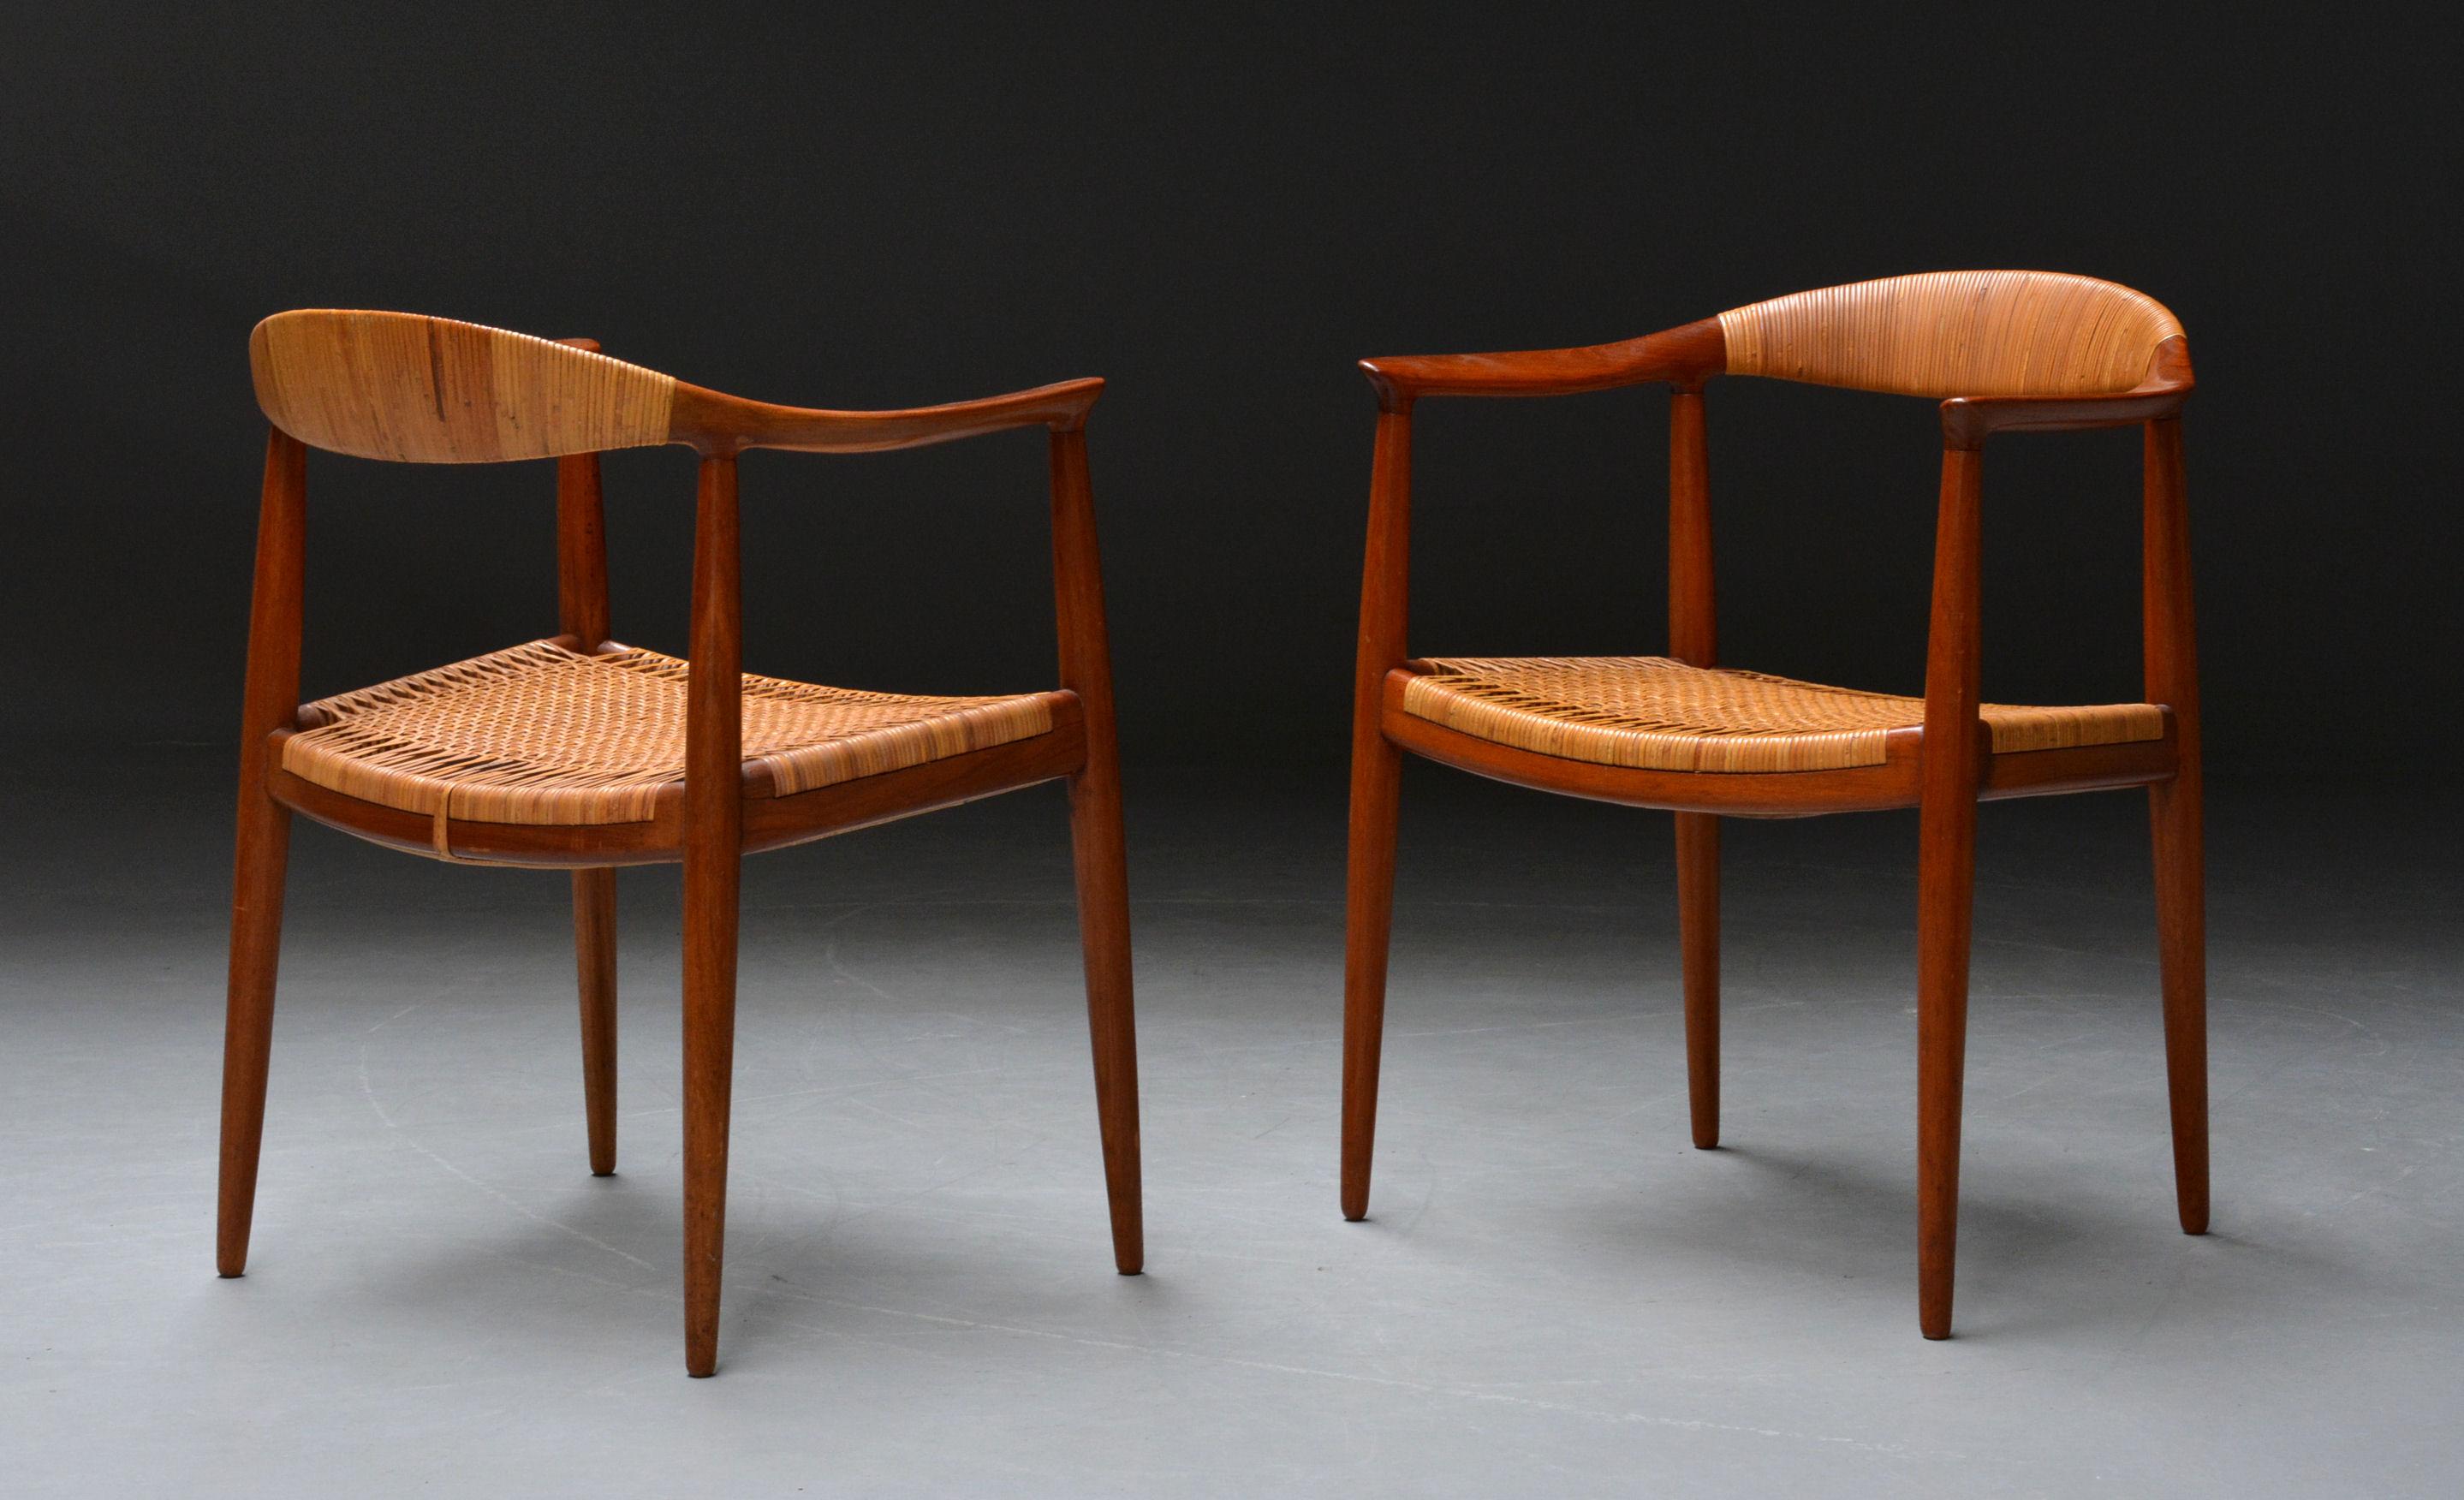 Hans J. Wegner for Johannes Hansen. Et par armstole, model JH501 The chair / Den runde stol - Hans J. Wegner 1914 - 2007. Et par armstole, model JH501 The Chair / Den runde stol, stel af massiv teak, sæde og kopstykke beviklet med sjeneflet. Formgivet i 1949. Tidlig model, fremstillet hos Snedkermester Johannes Hansen. Alm. aldersrelateret...